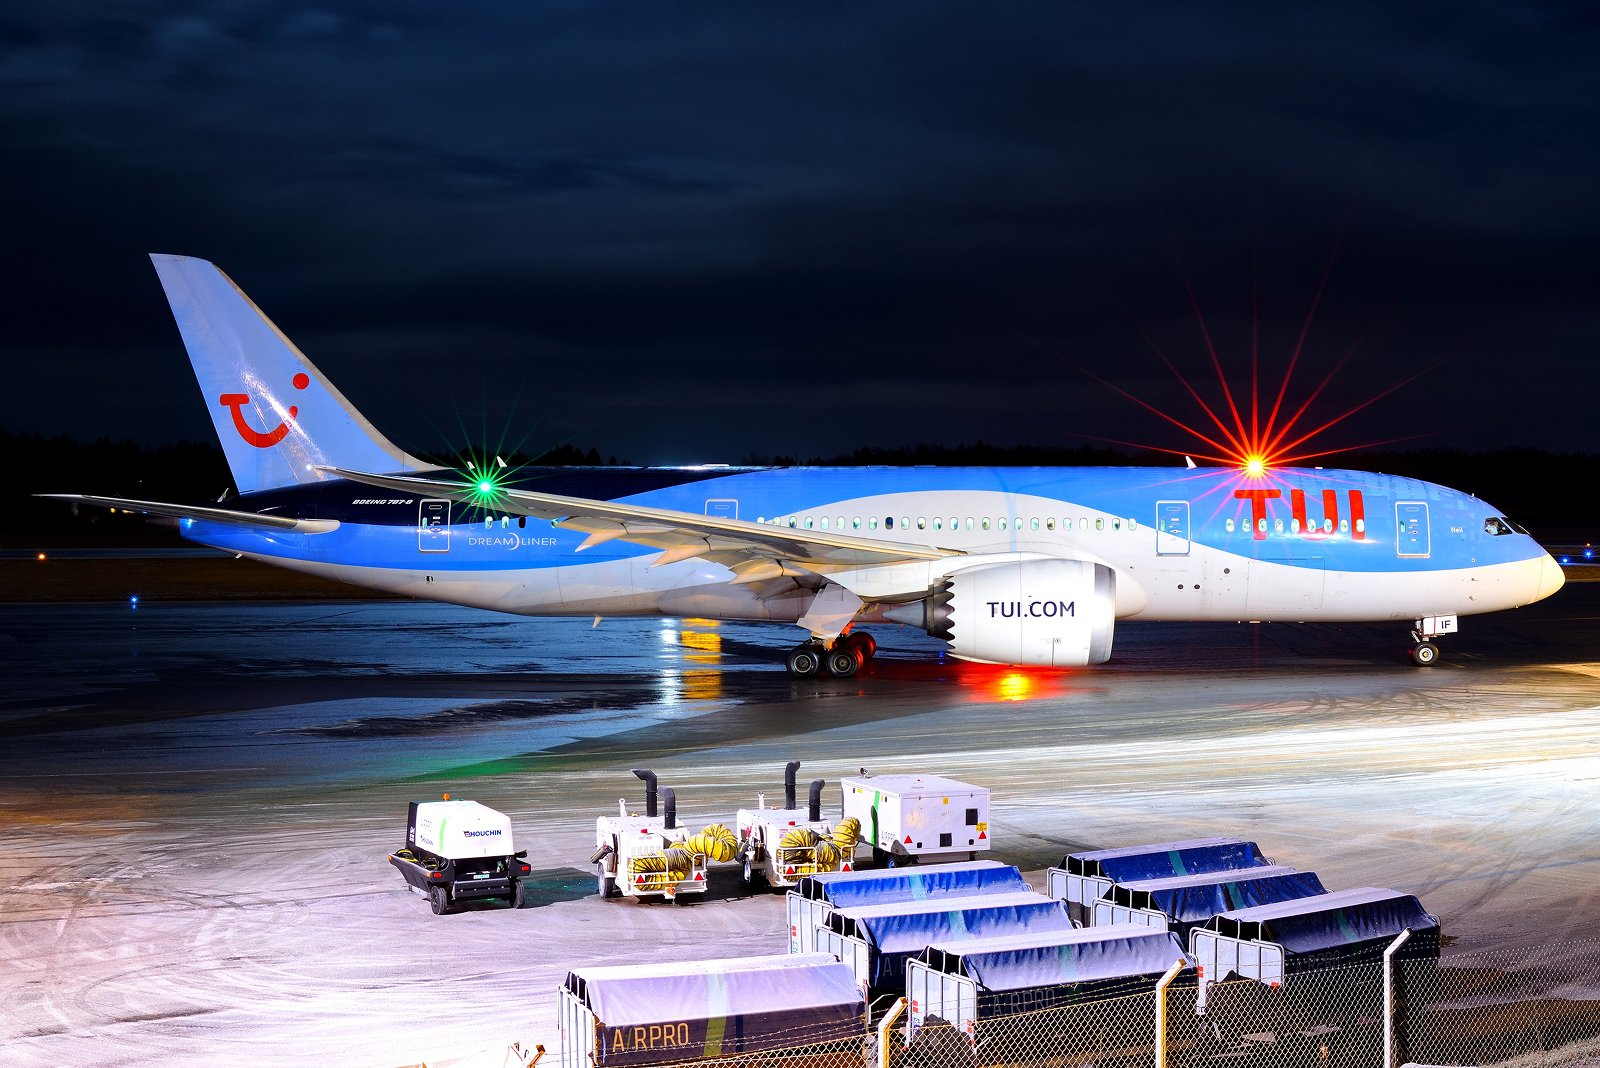 G-TUIF - Boeing 787-8 Dreamliner - TUI - 10.1.2020